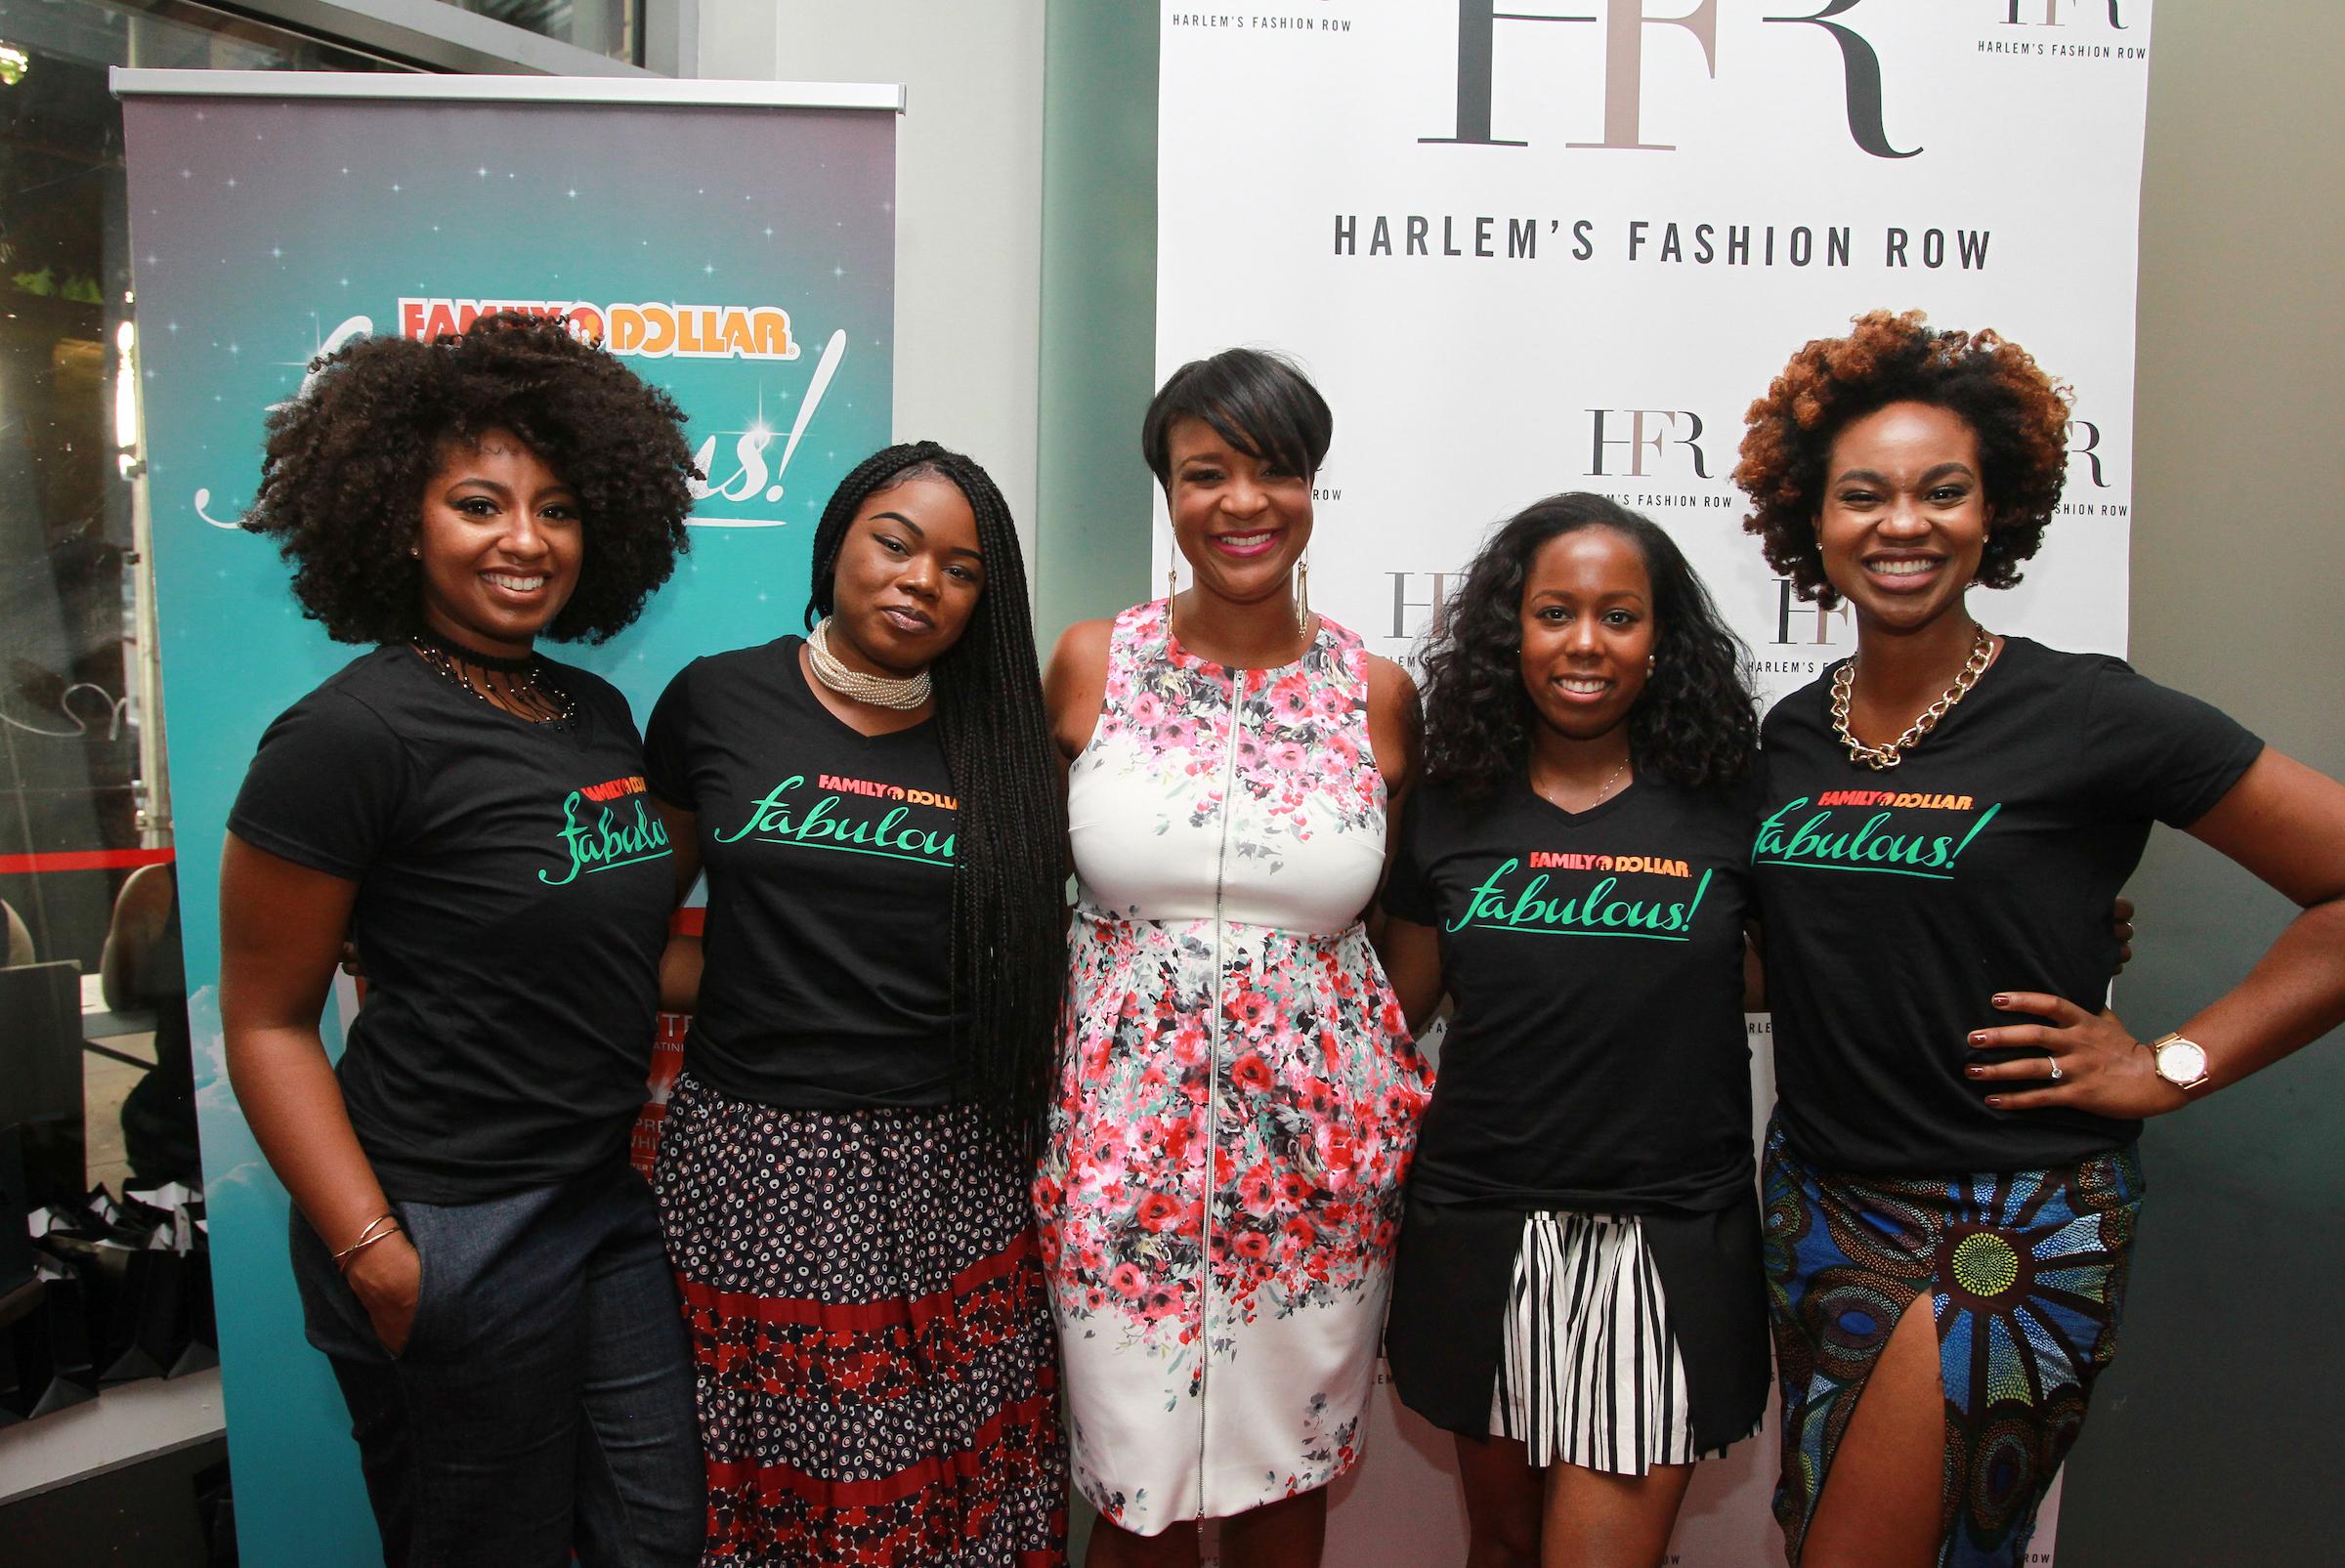 HFR Founder Brandice with myself and Influencer Micaela @Micaelaverelien Jacqueline @livelovelaurean and Ijeoma @KlassyKinks